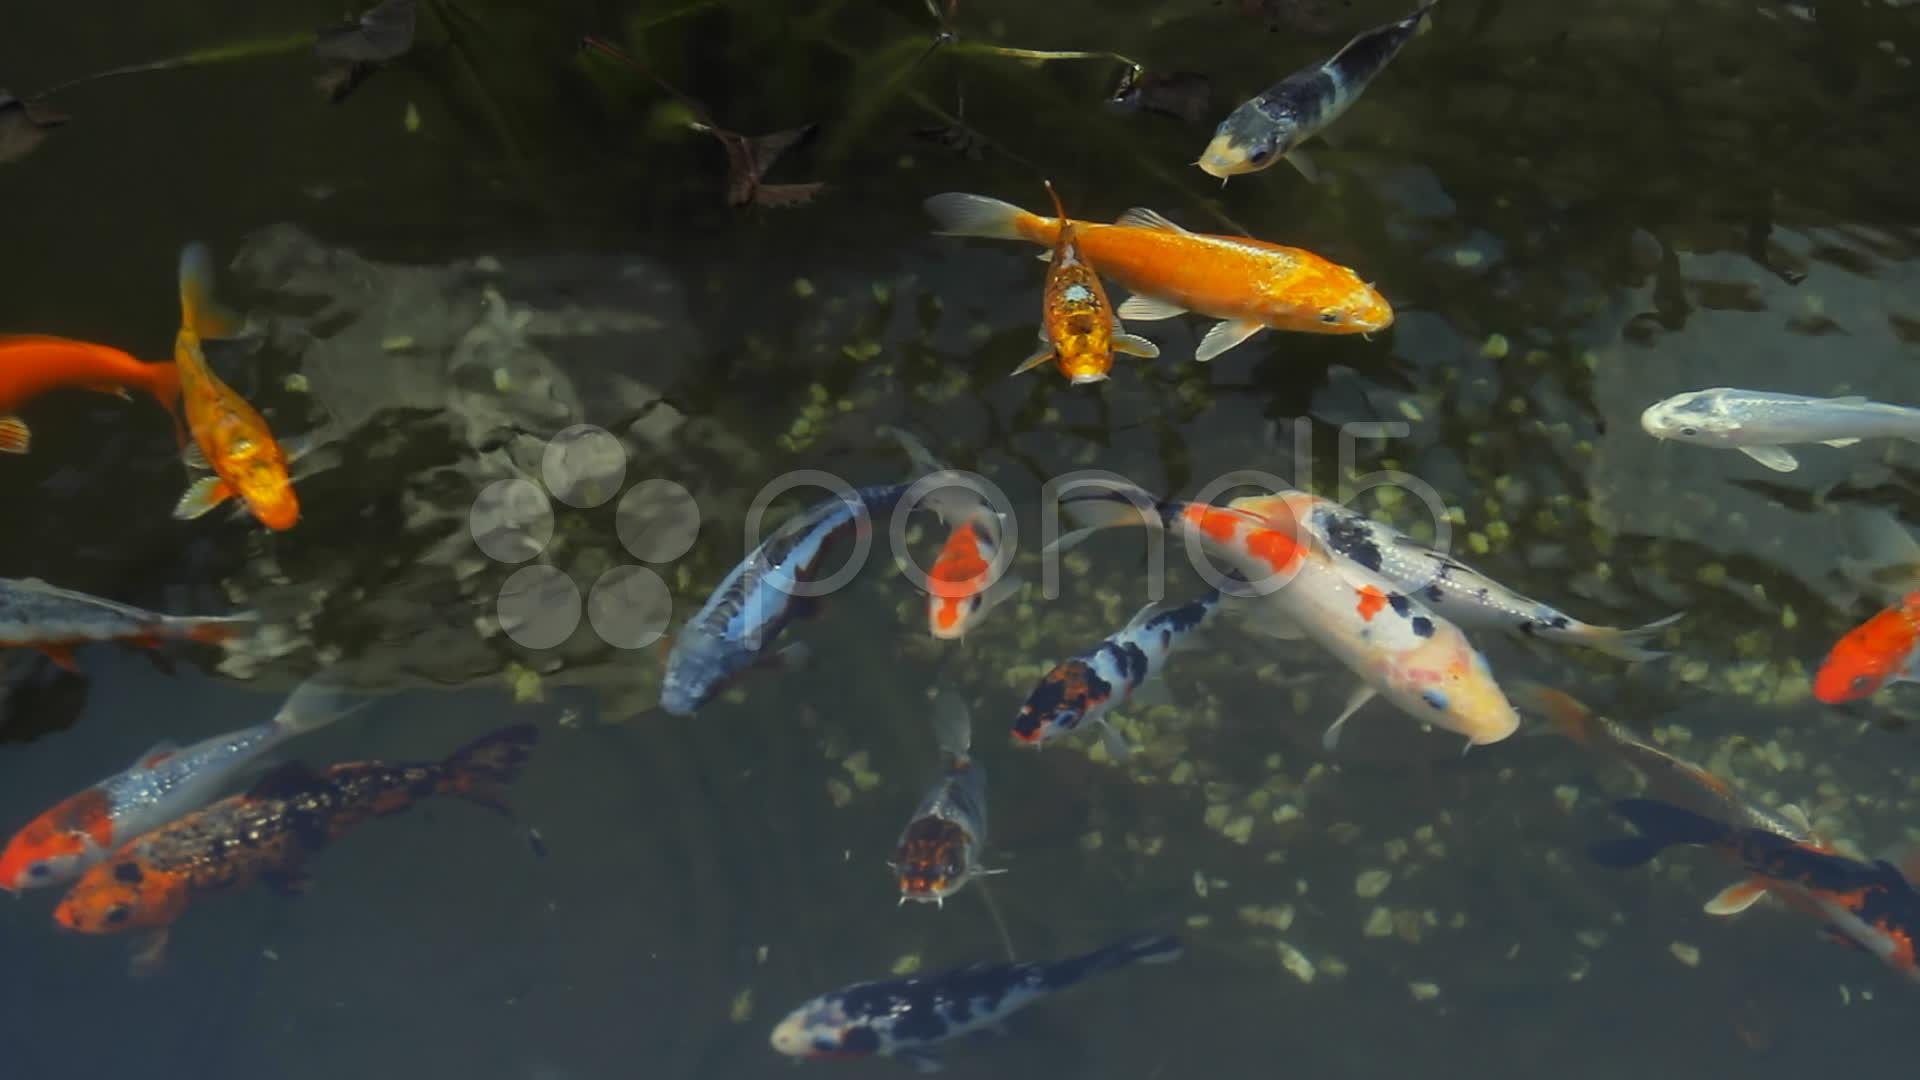 Koi fish pond overhead view hd stock video 10739605 for Koi fish pond hd